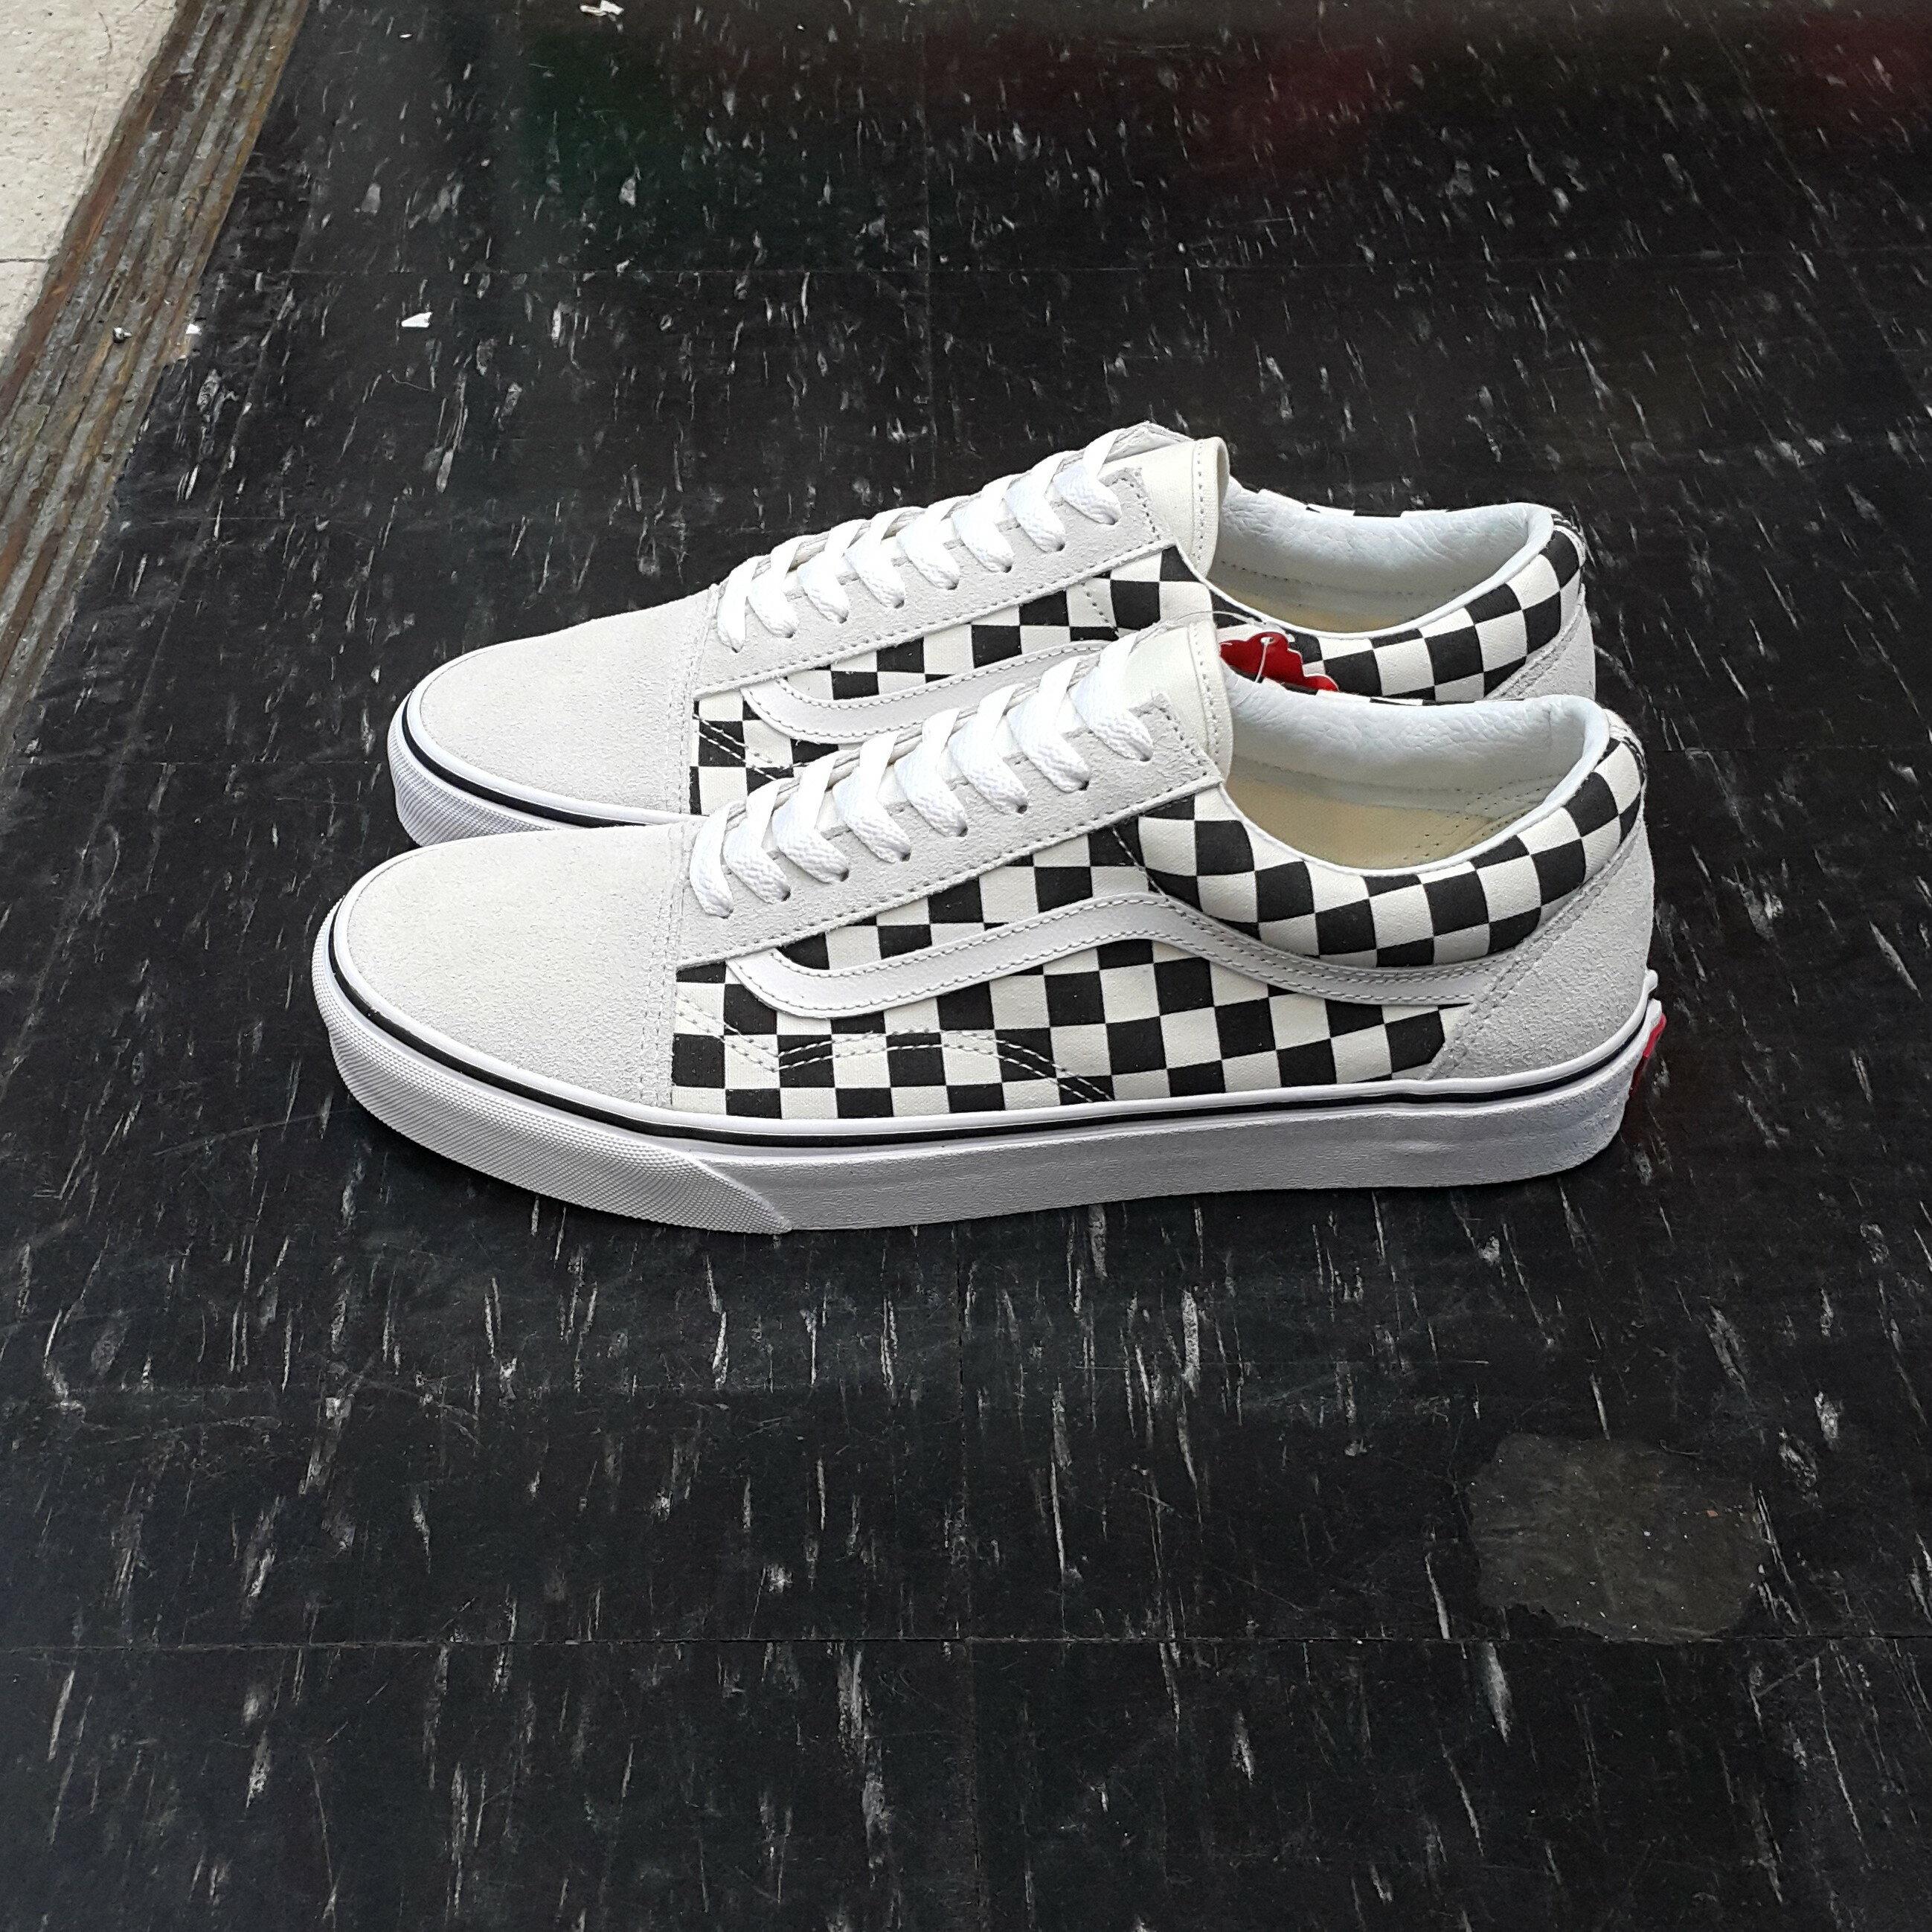 VANS Old Skool Checkerboard White / Black 棋盤格 白黑 白色 米白色 黑色 麂皮 帆布 格子 基本款 滑板鞋